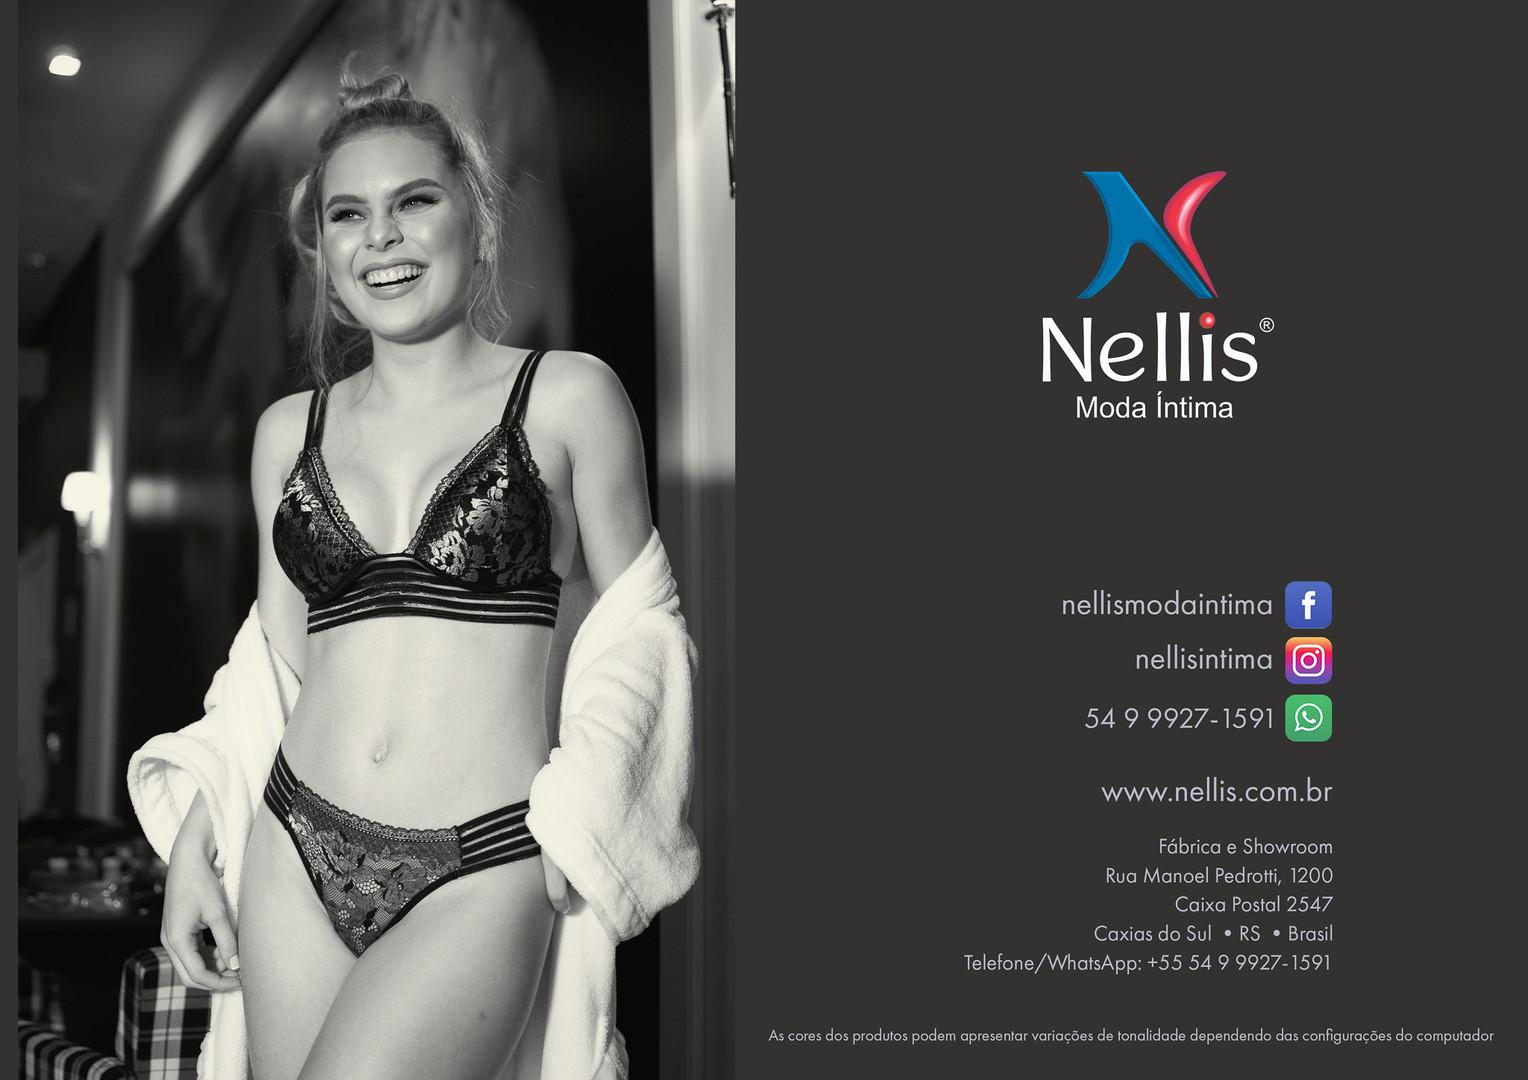 CatalogoNellis_Wix-24.jpg